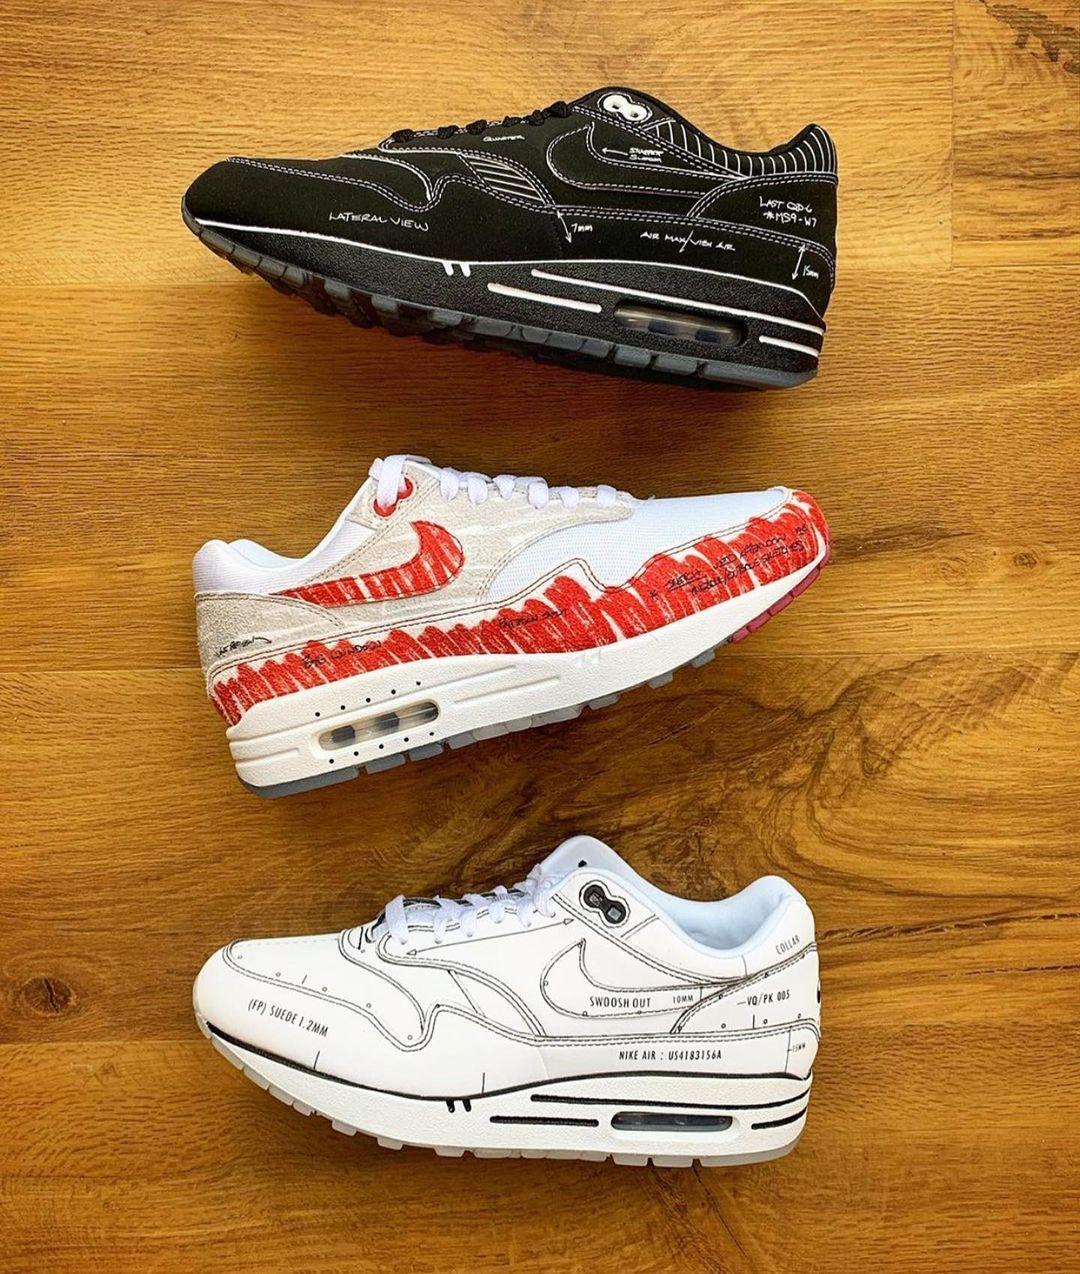 Nike Air Max - opus42.com